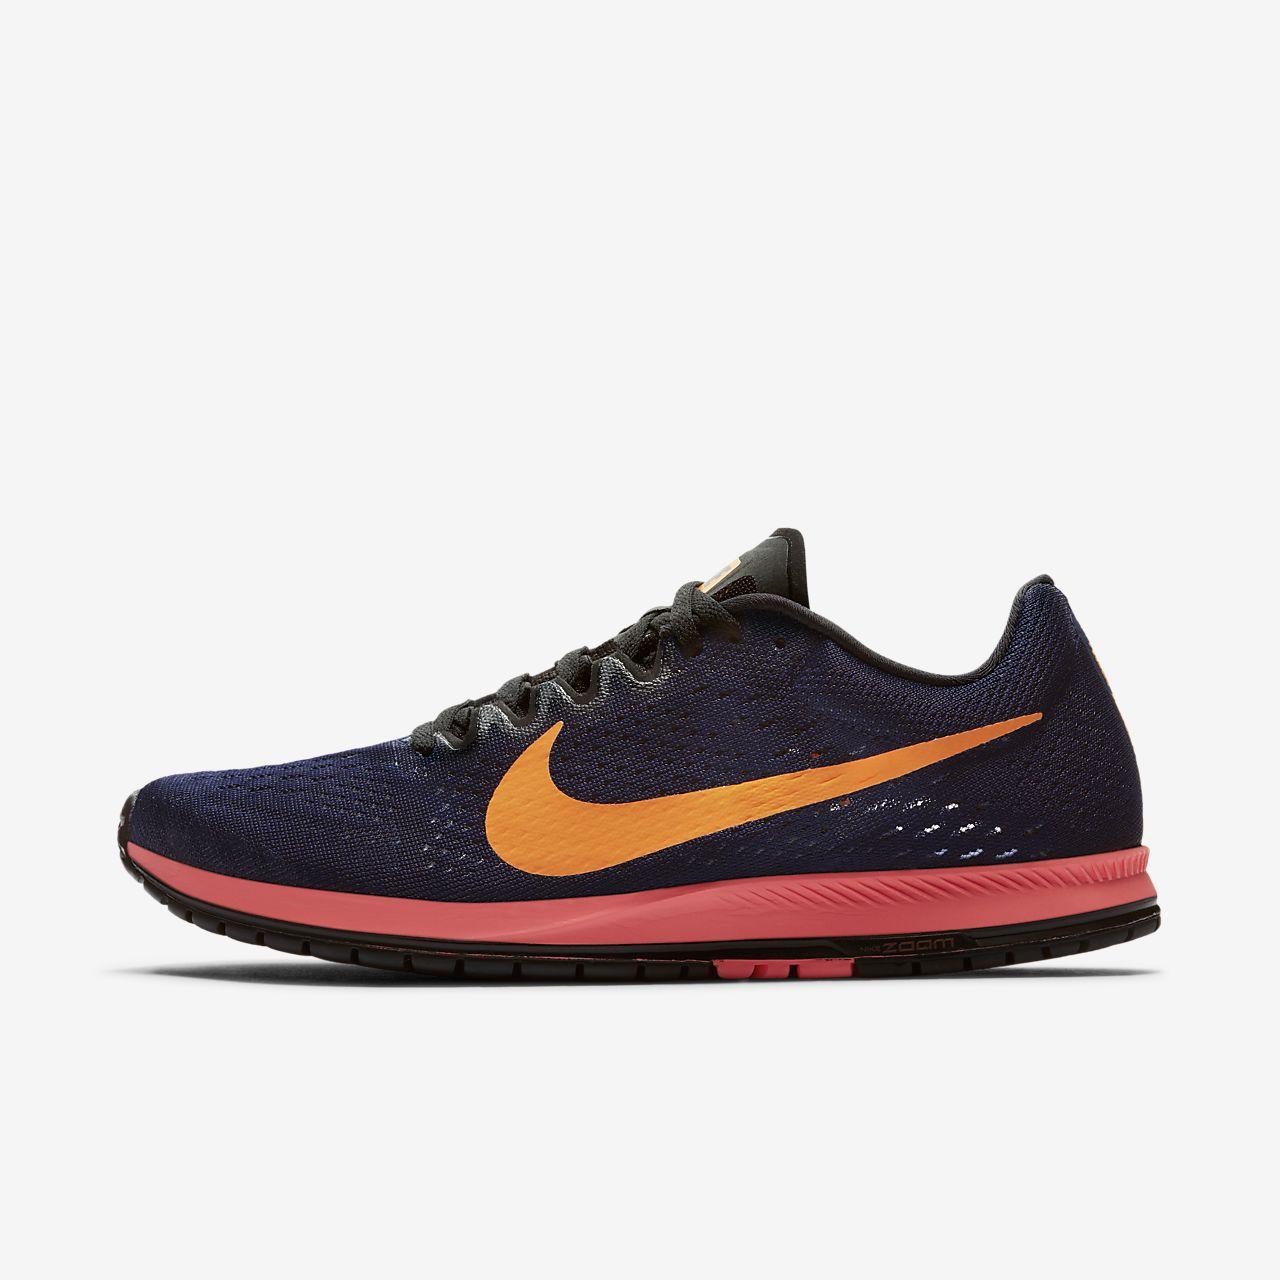 d6a258514add ... get chaussure de course mixte nike zoom streak 6 a571e 7e304